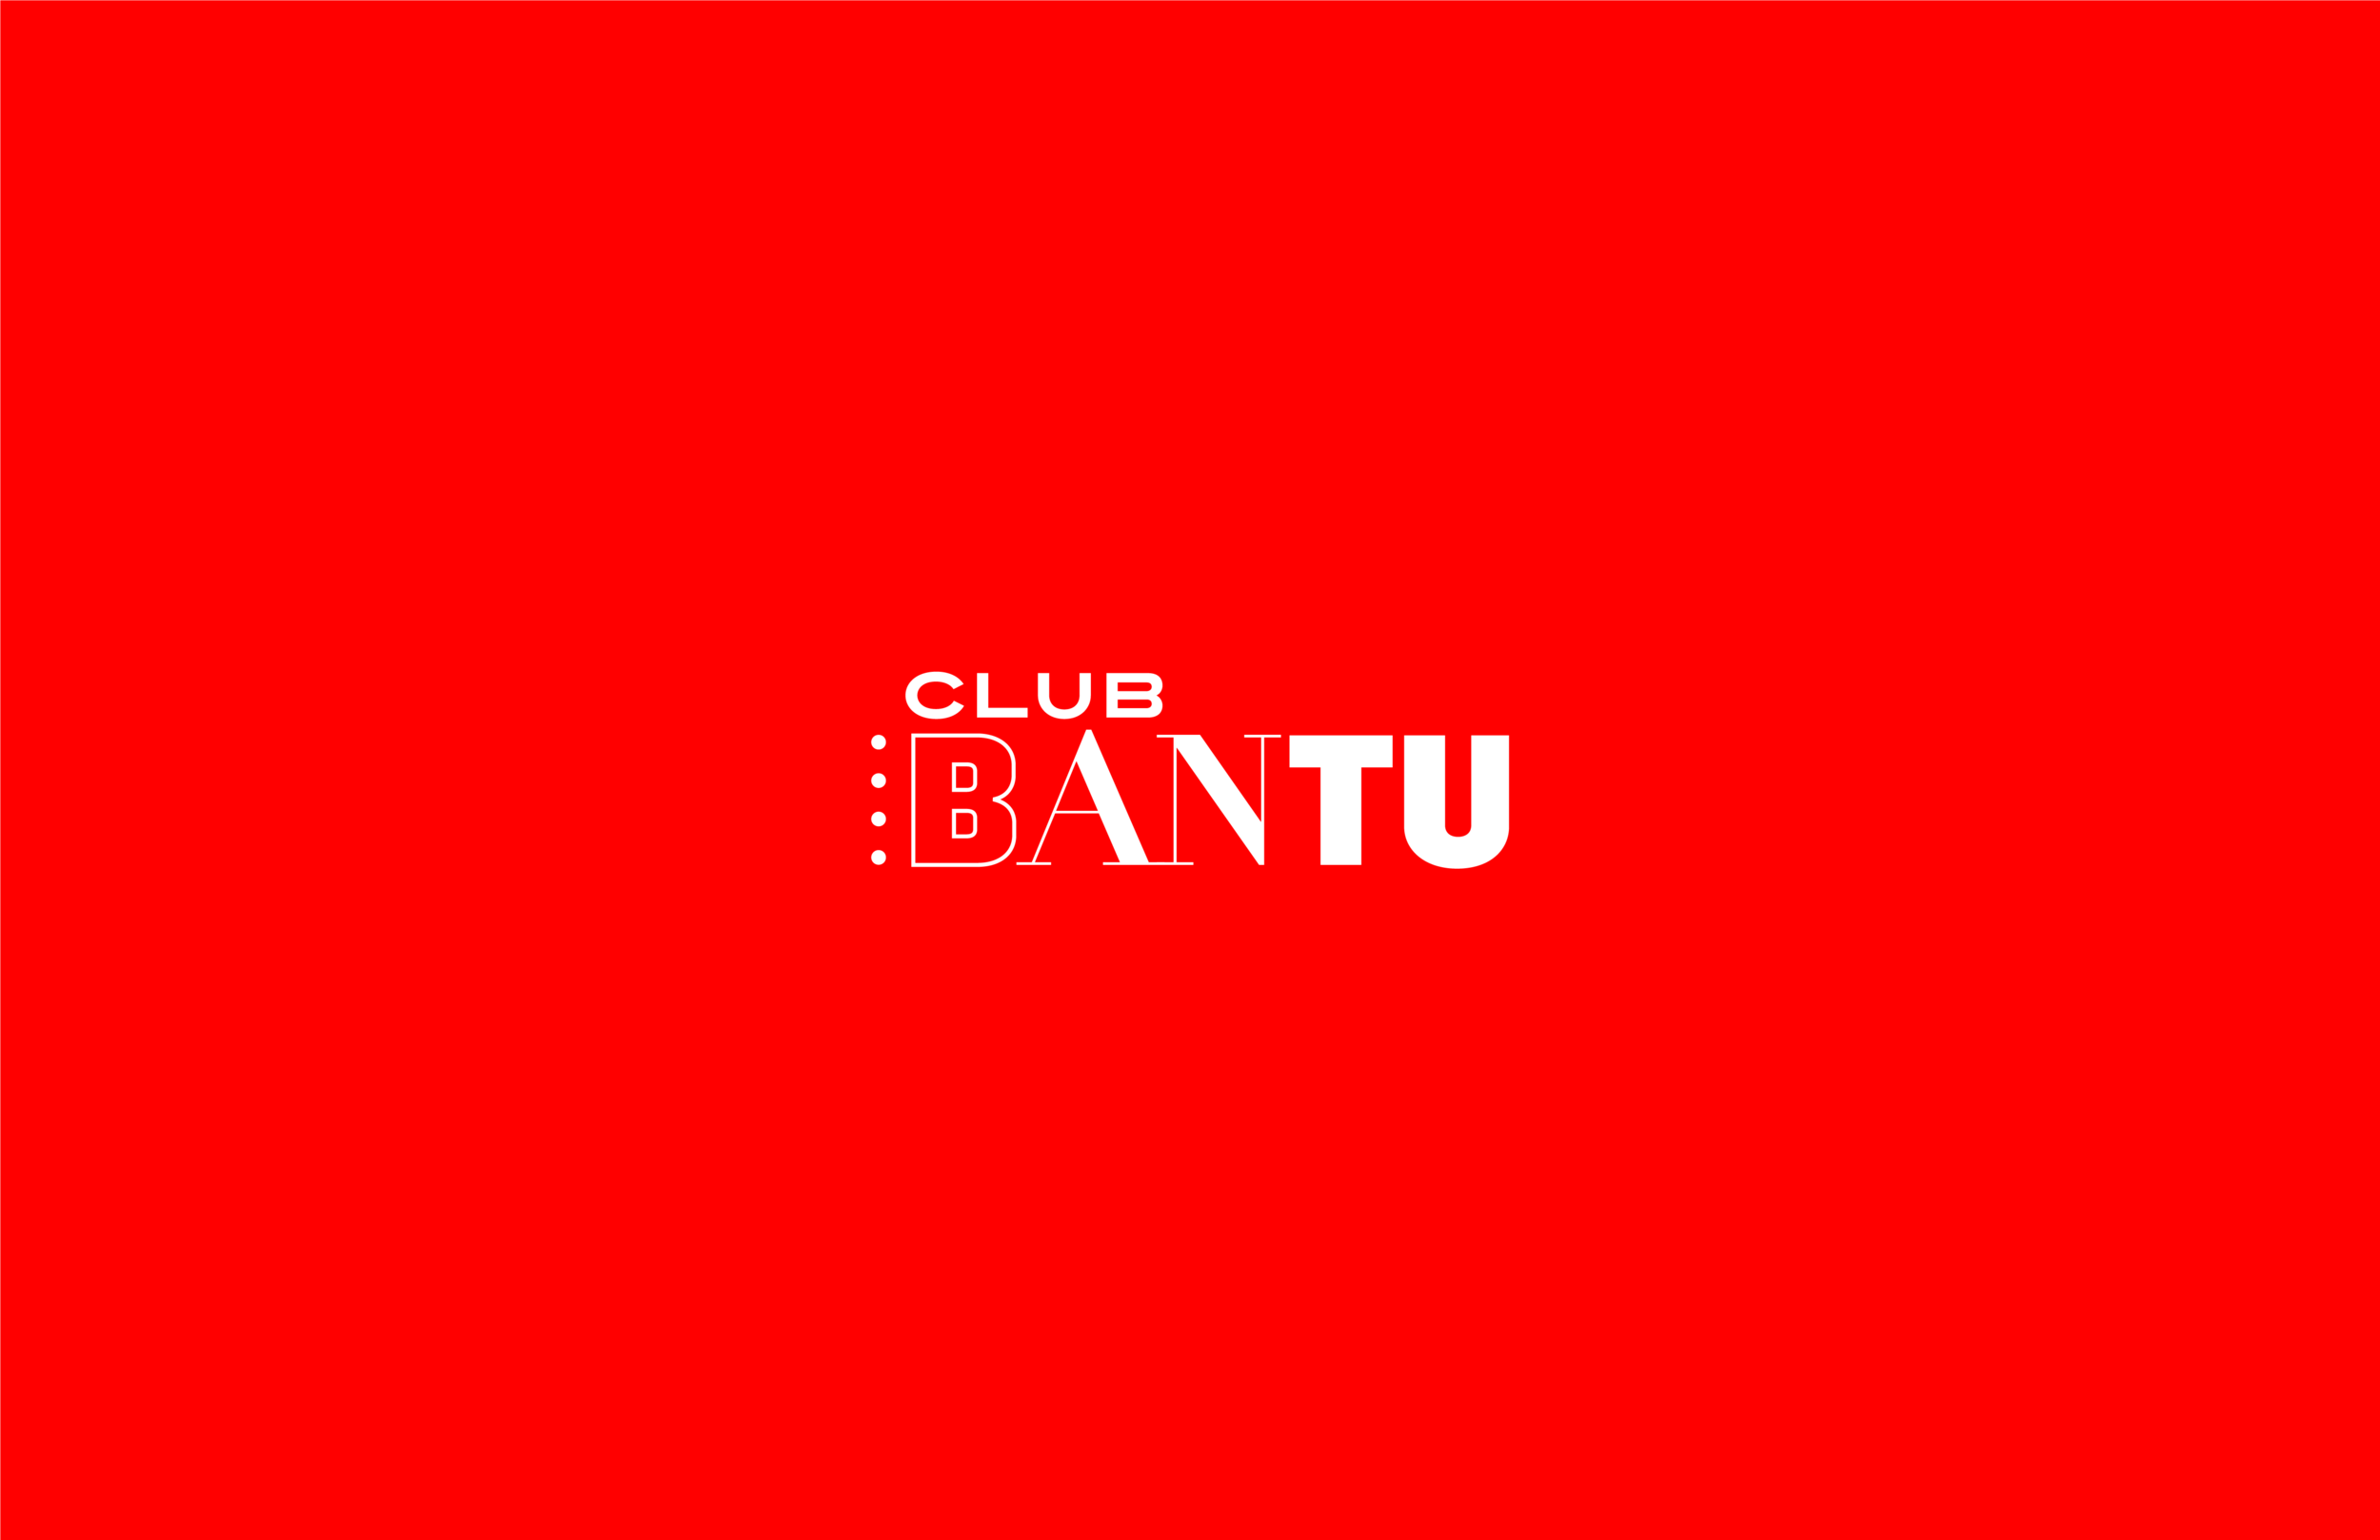 ClubBantuLogos-04.png